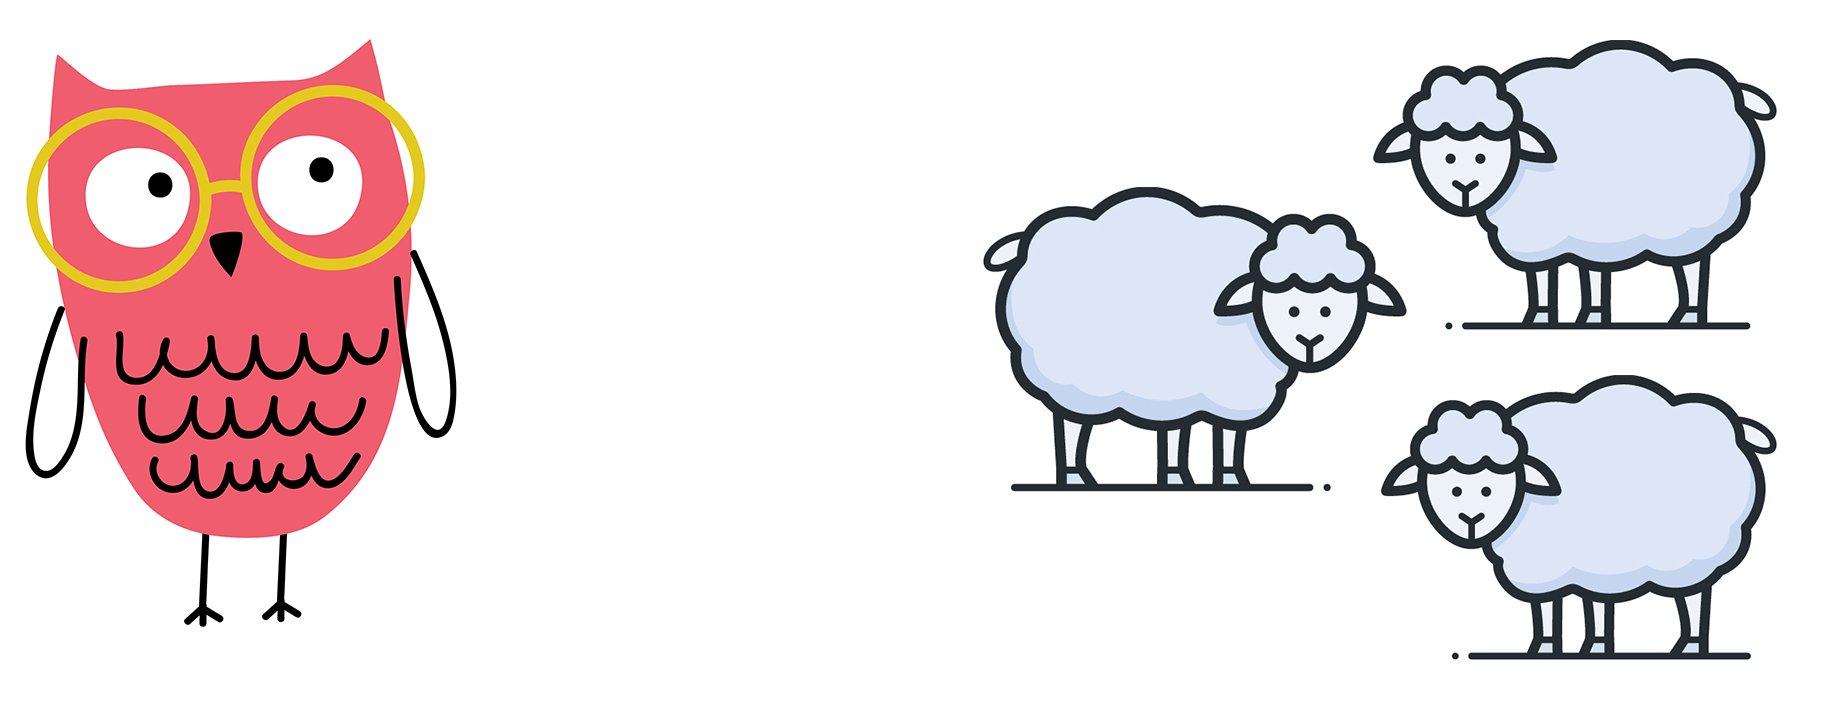 https://careernet.com/wp-content/uploads/2021/06/owl-and-sheep-copy.jpg